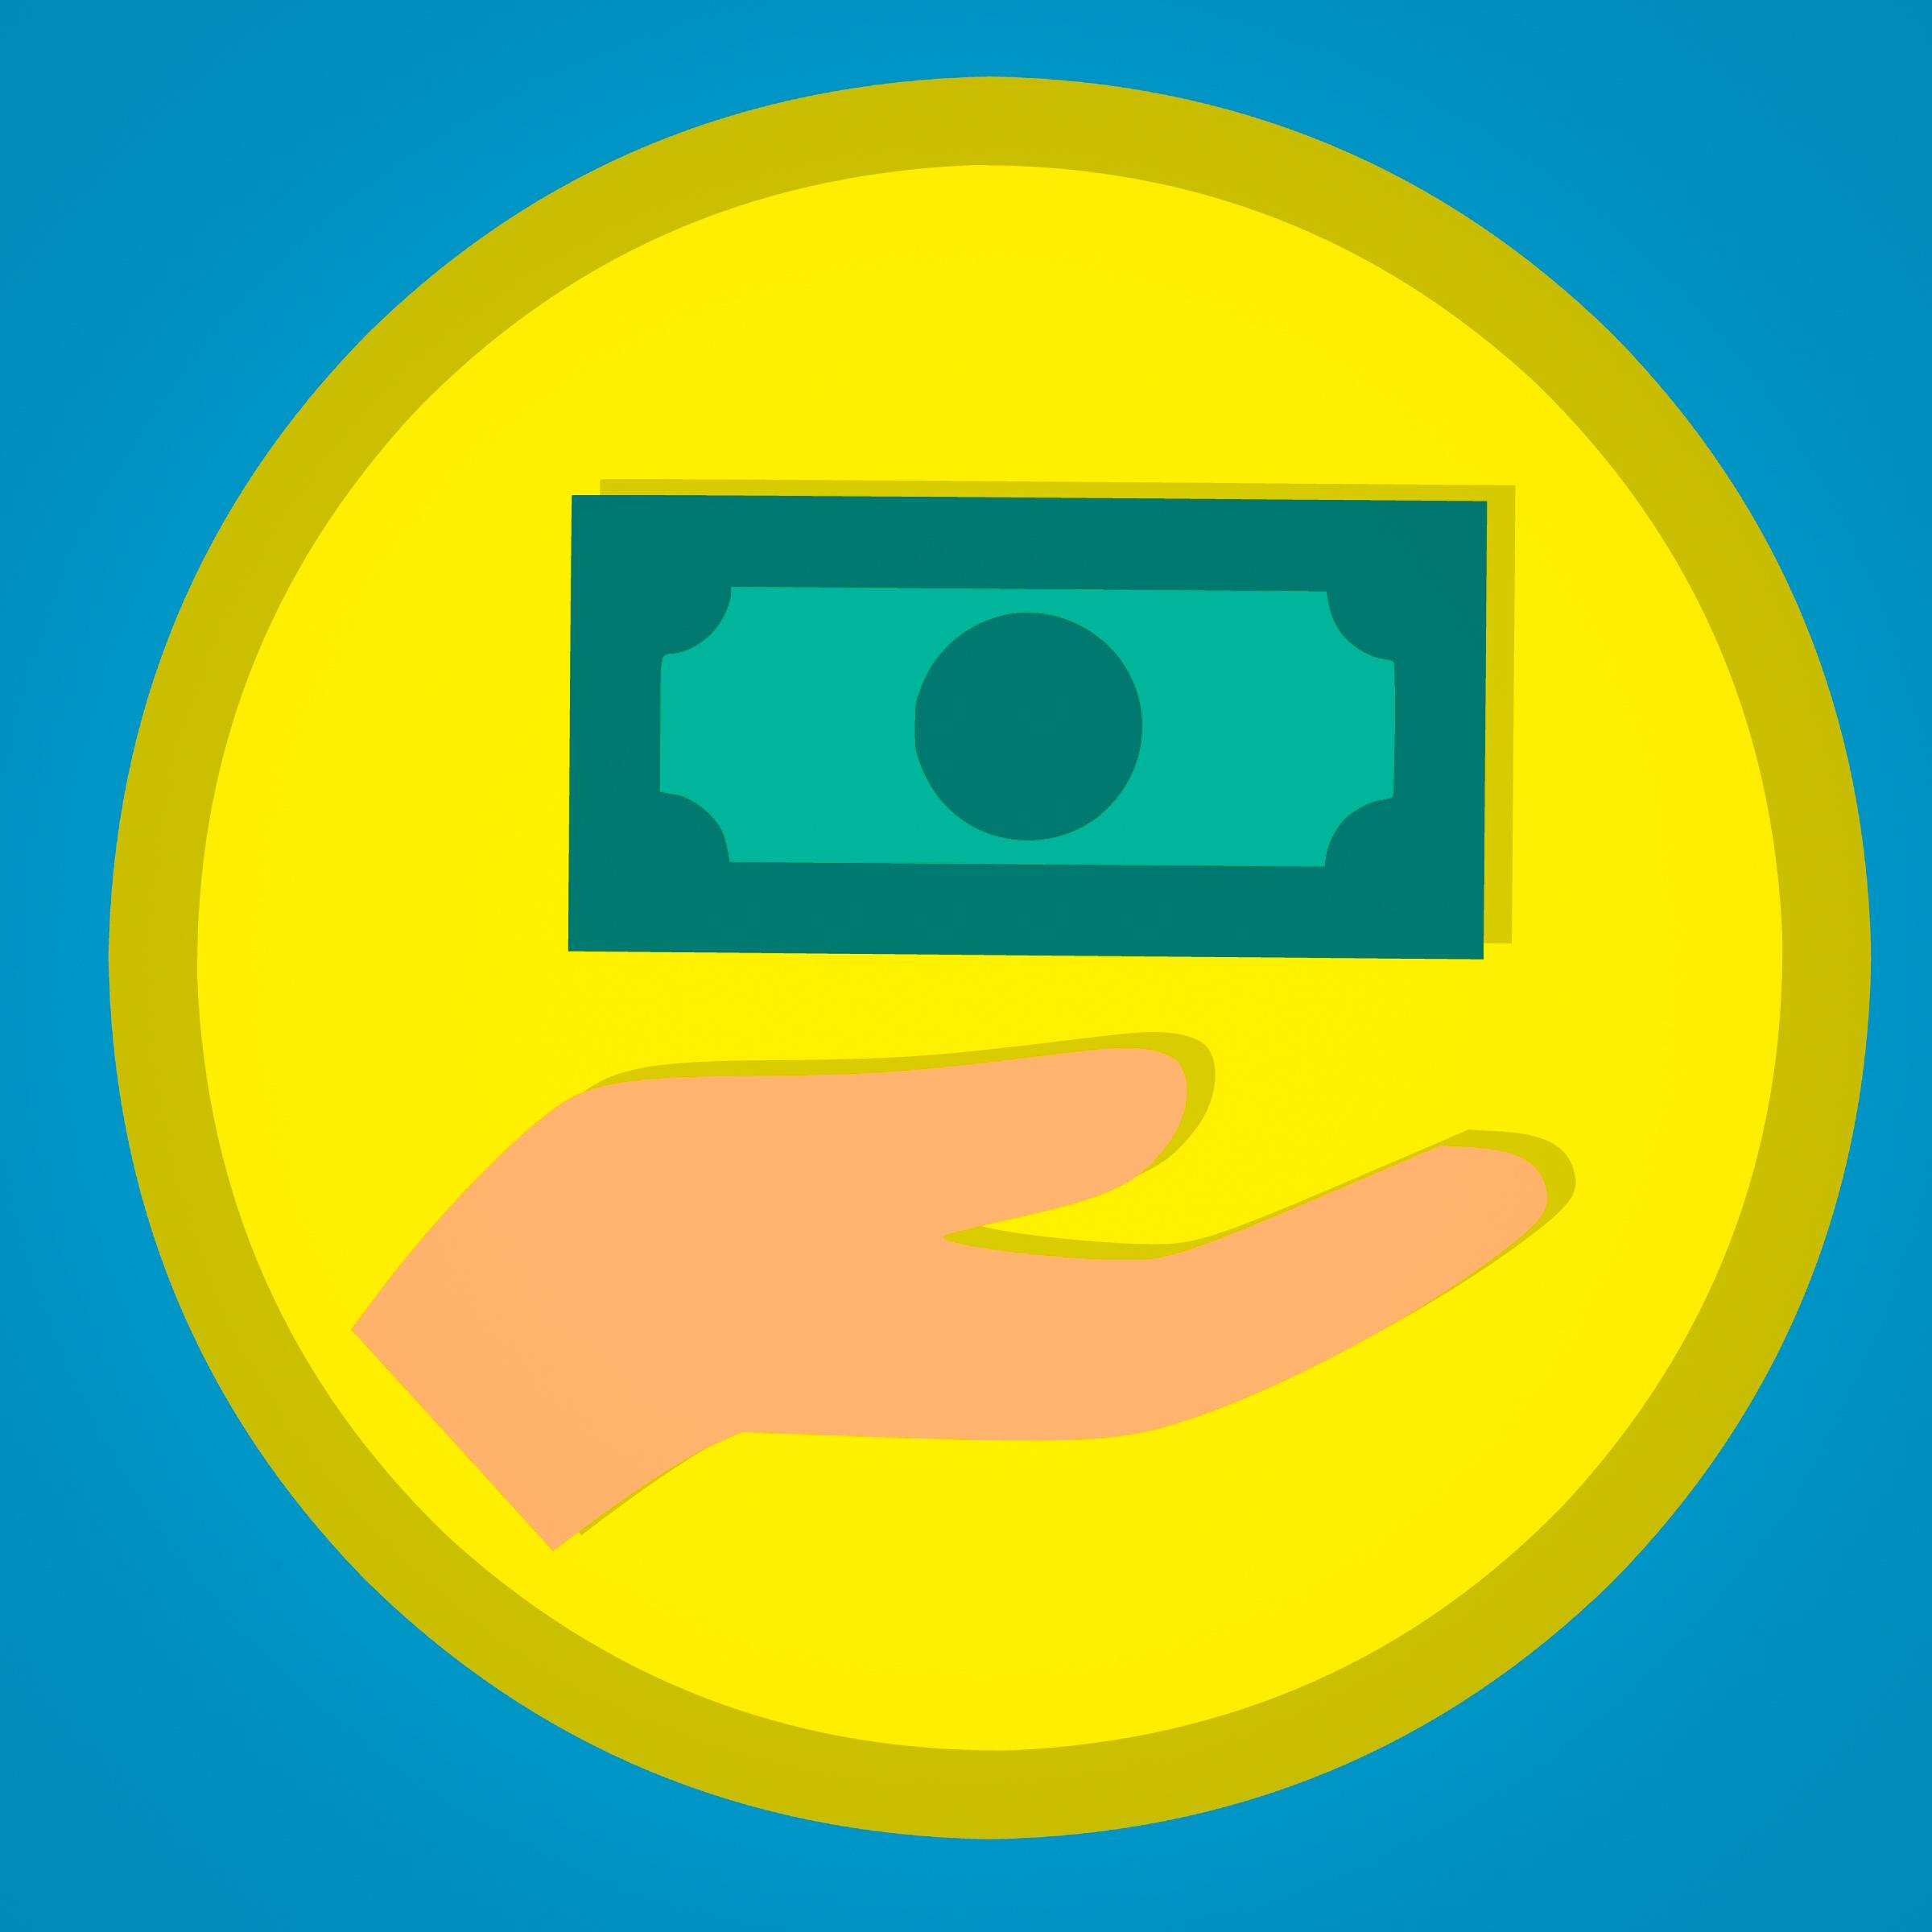 Gambar Icon Dolar Memberi Lencana Kas Perbankan